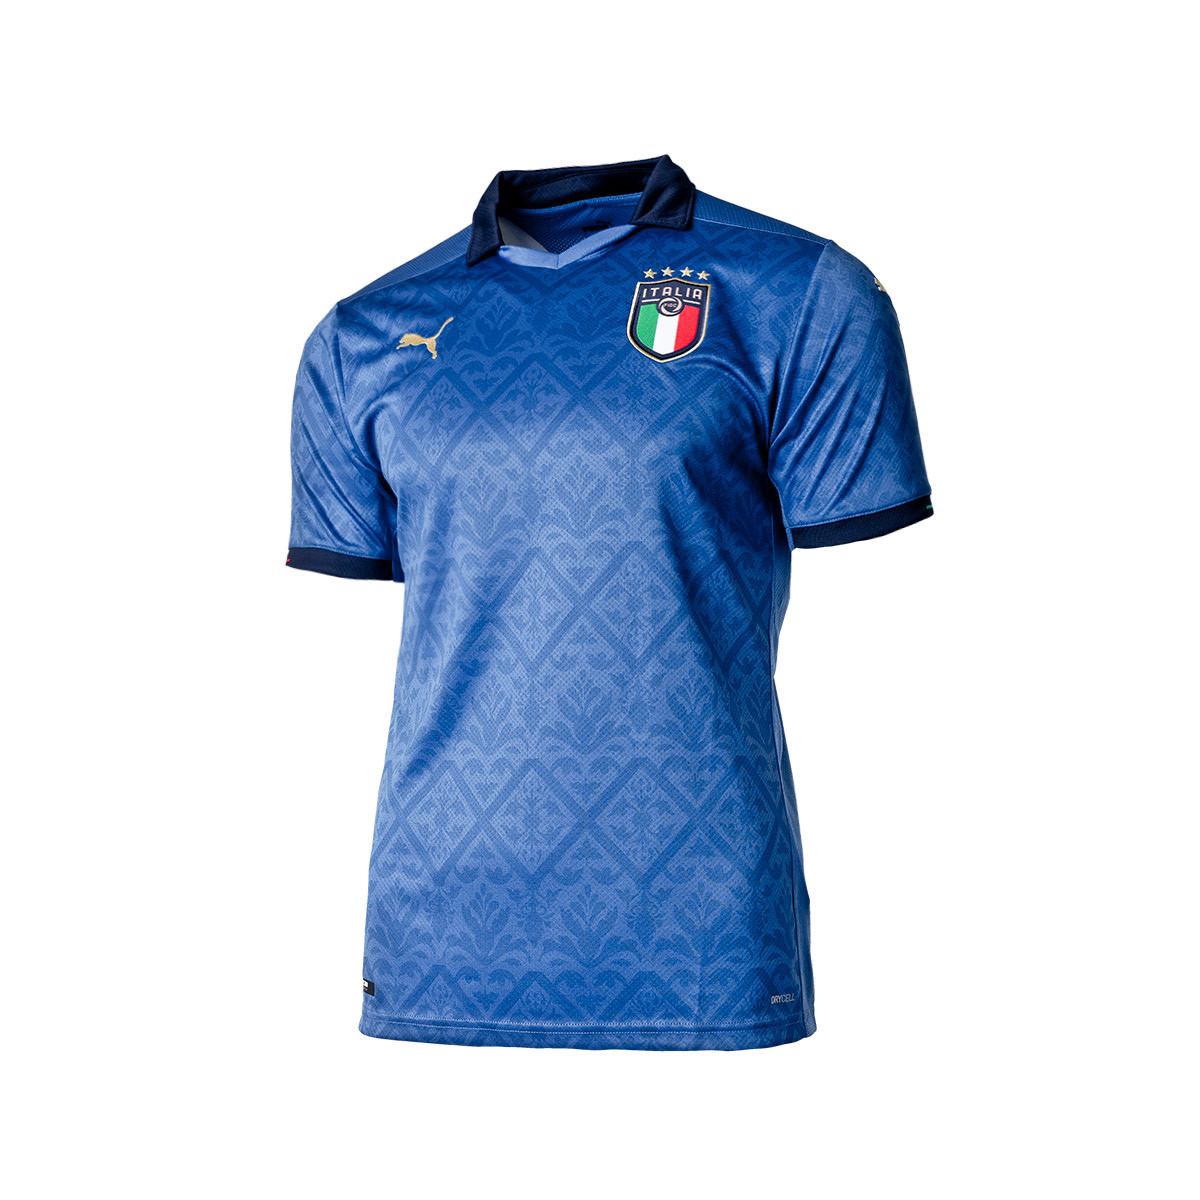 Puma Italy Home Replica 2020-2021 Kids Jersey